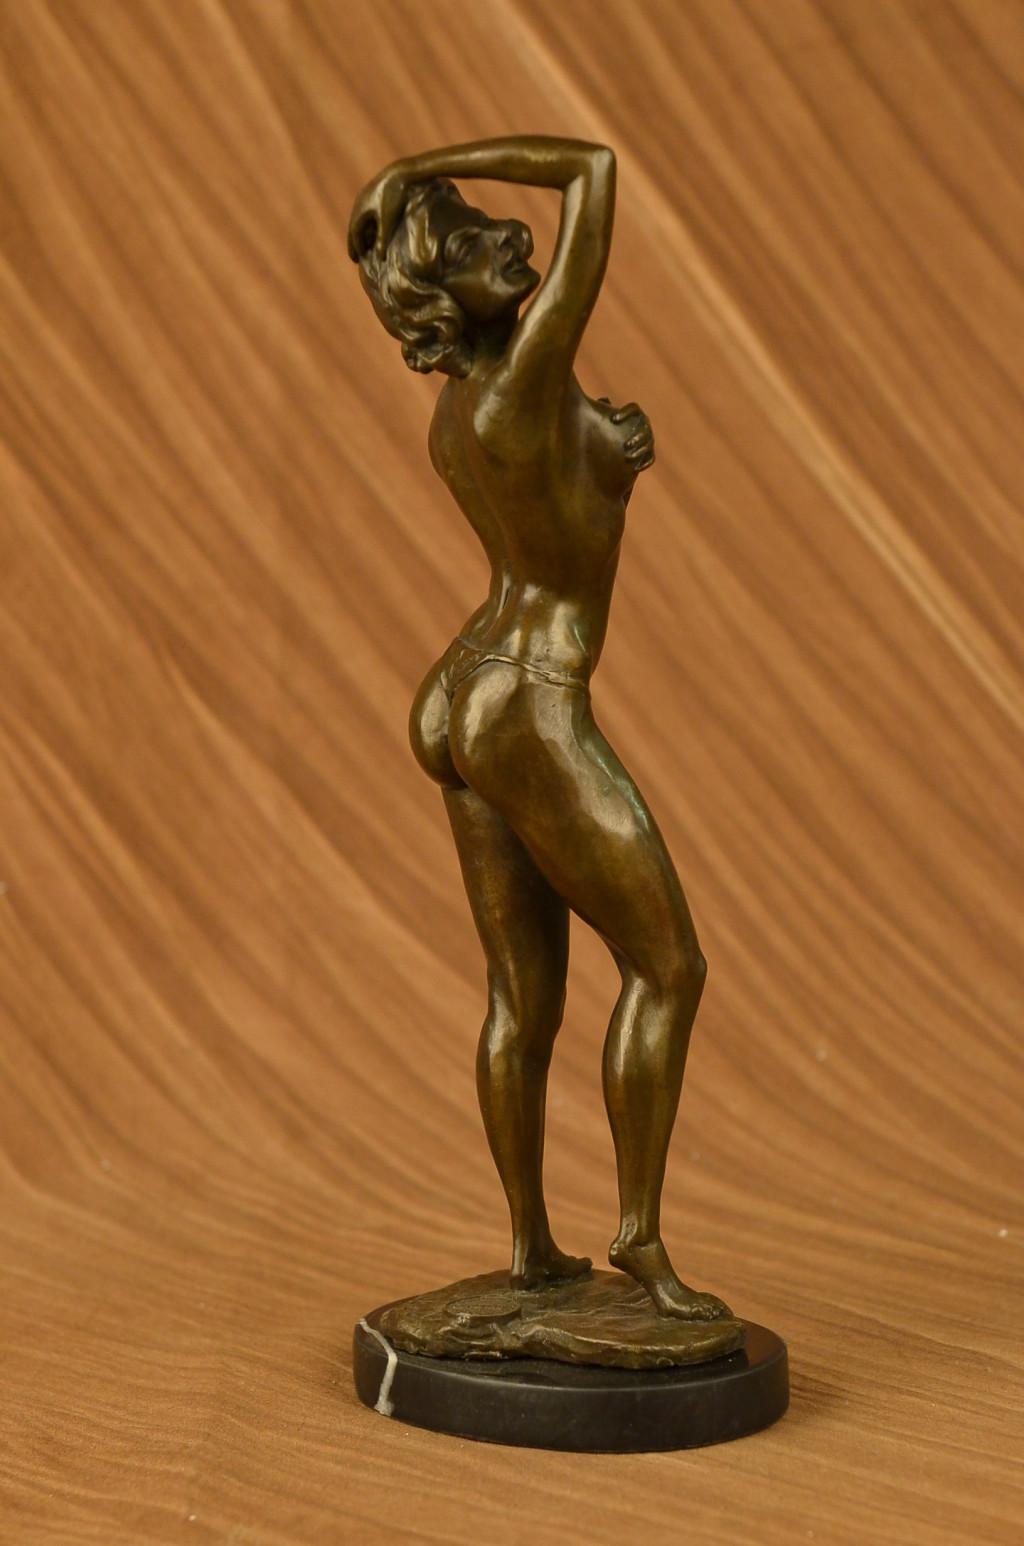 Скульптура голой девушки фото 14 фотография